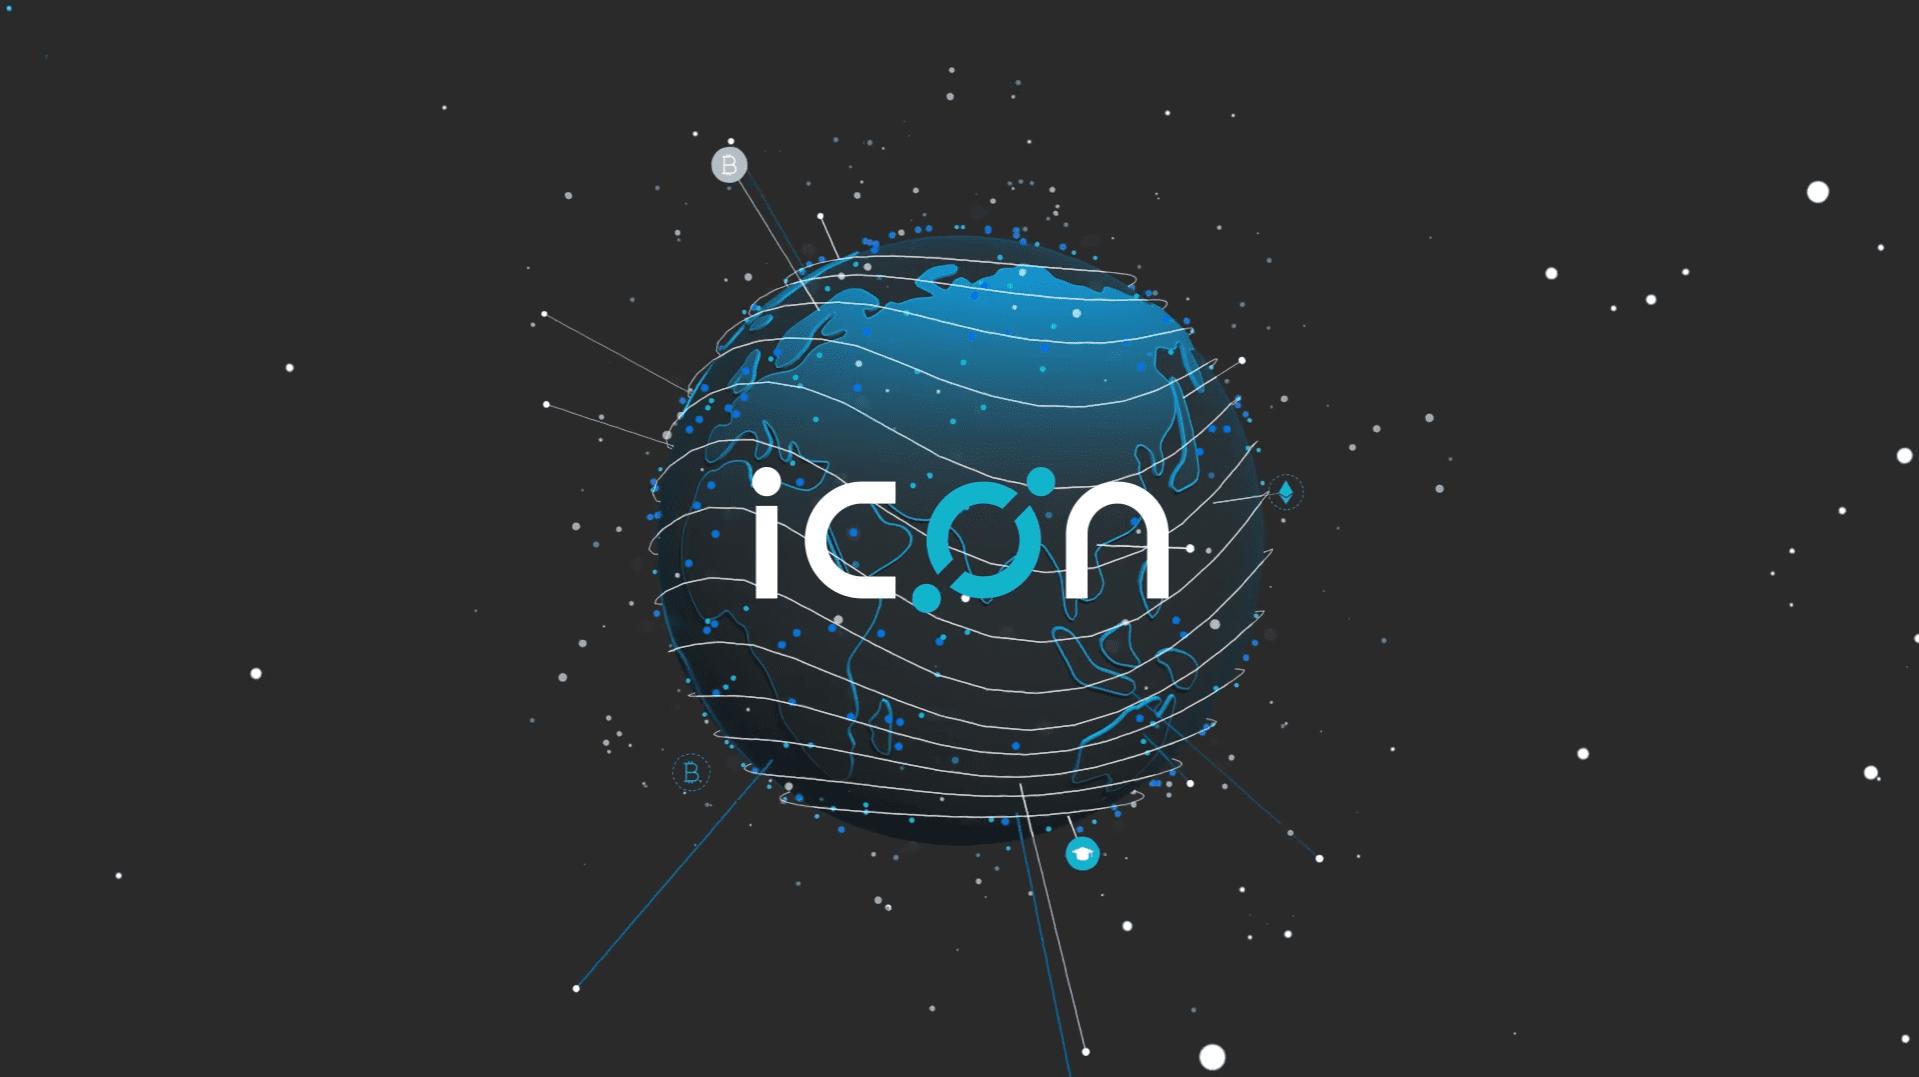 Обзор криптовалюты ICON. Особенности майнинга ICX